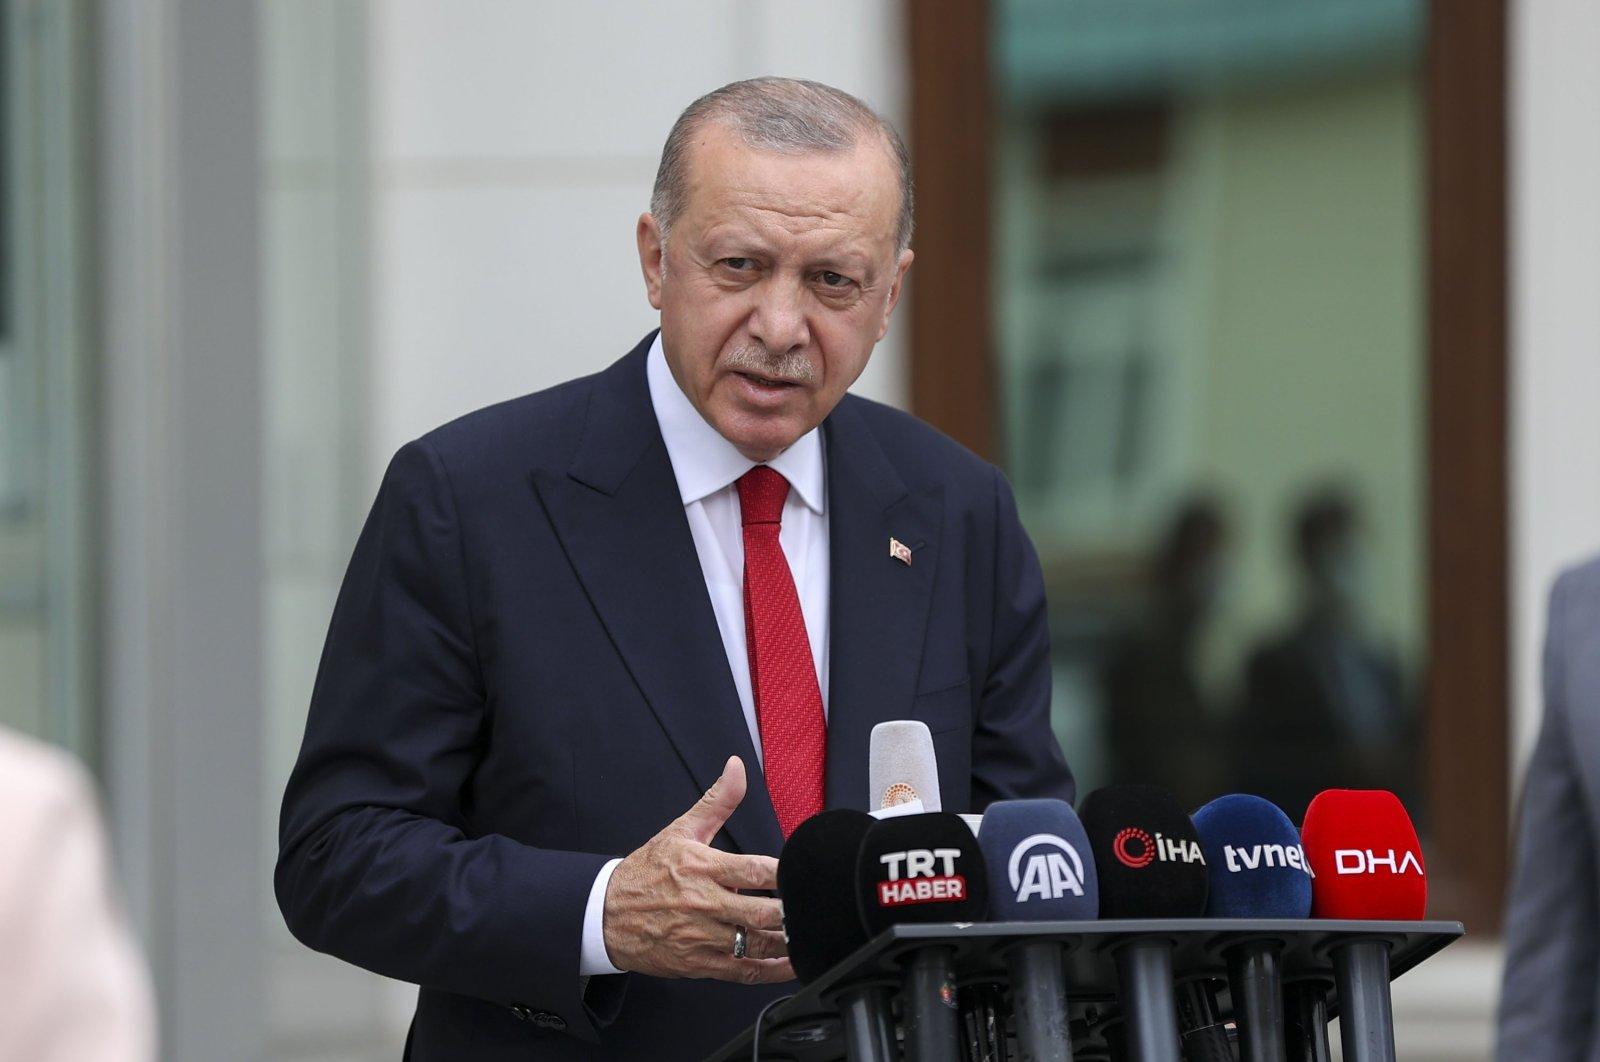 President Recep Tayyip Erdoğan speaks to the press after attending a prayer at Çilehane Mosque in Istanbul's Üsküdar, Turkey, Aug. 11, 2021 (AA File Photo)